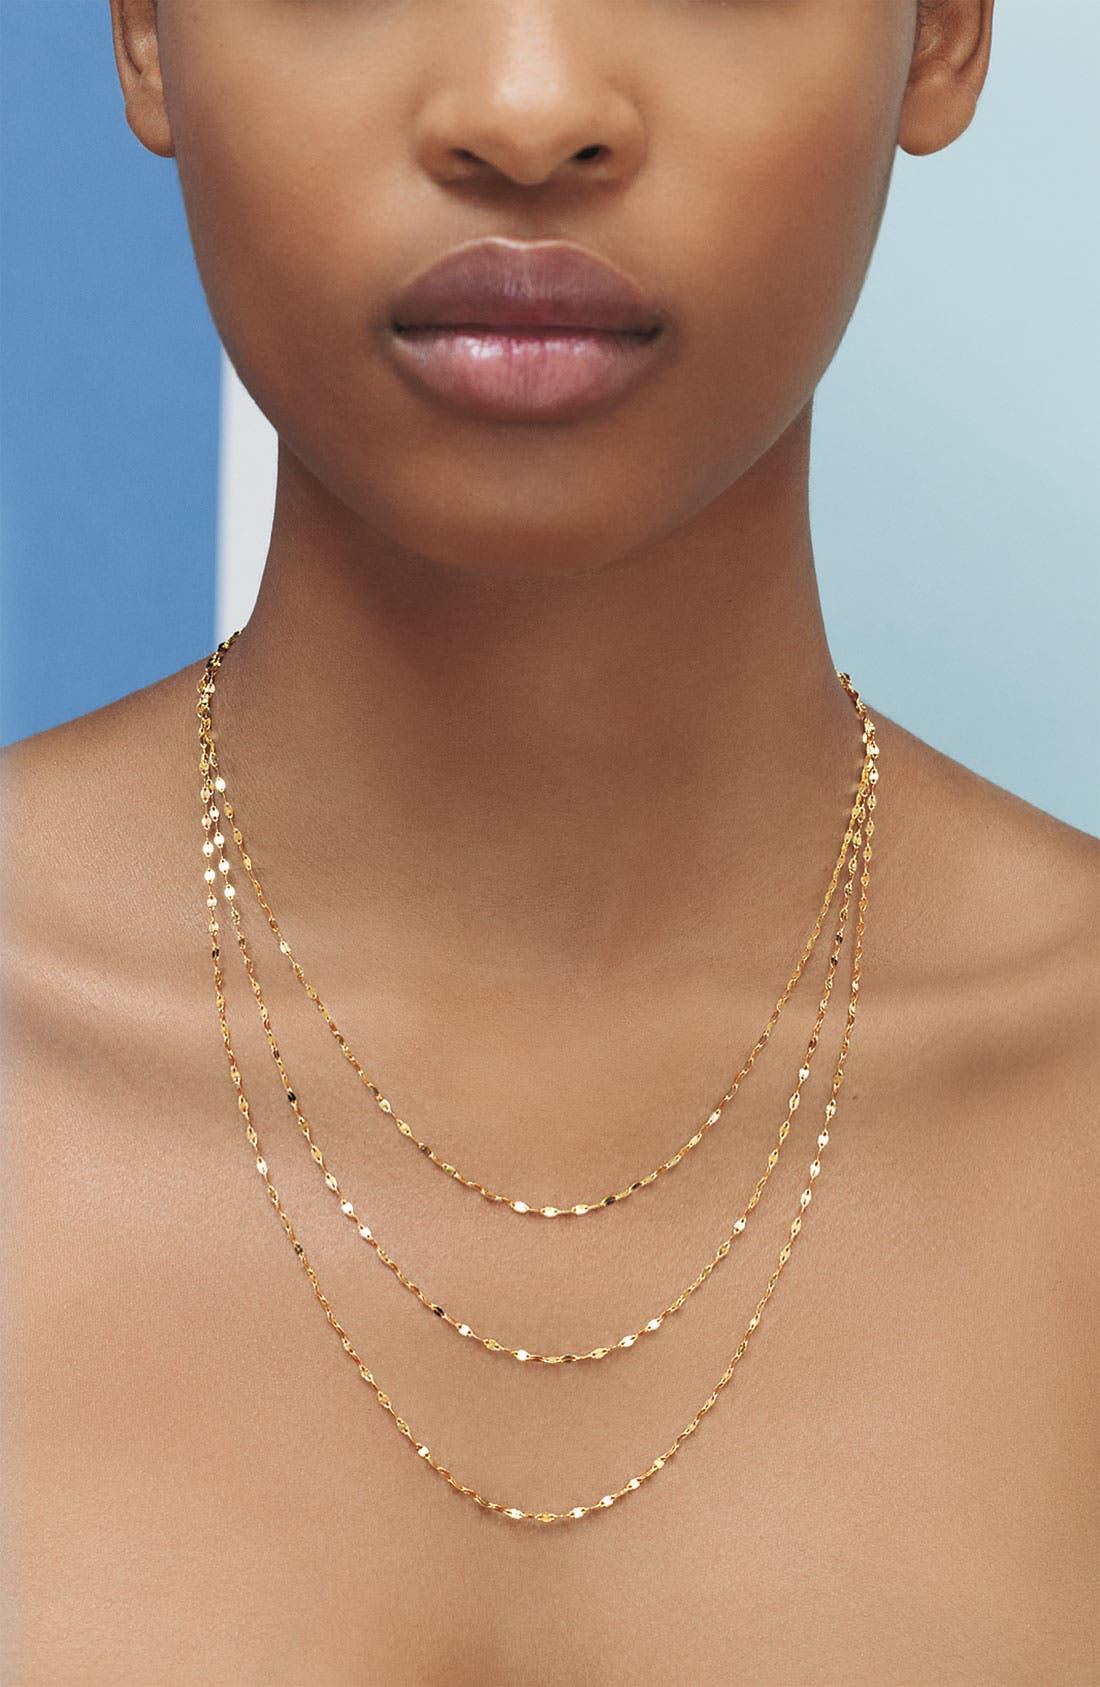 Alternate Image 2  - Lana Jewelry 'Small Sienna' Necklace